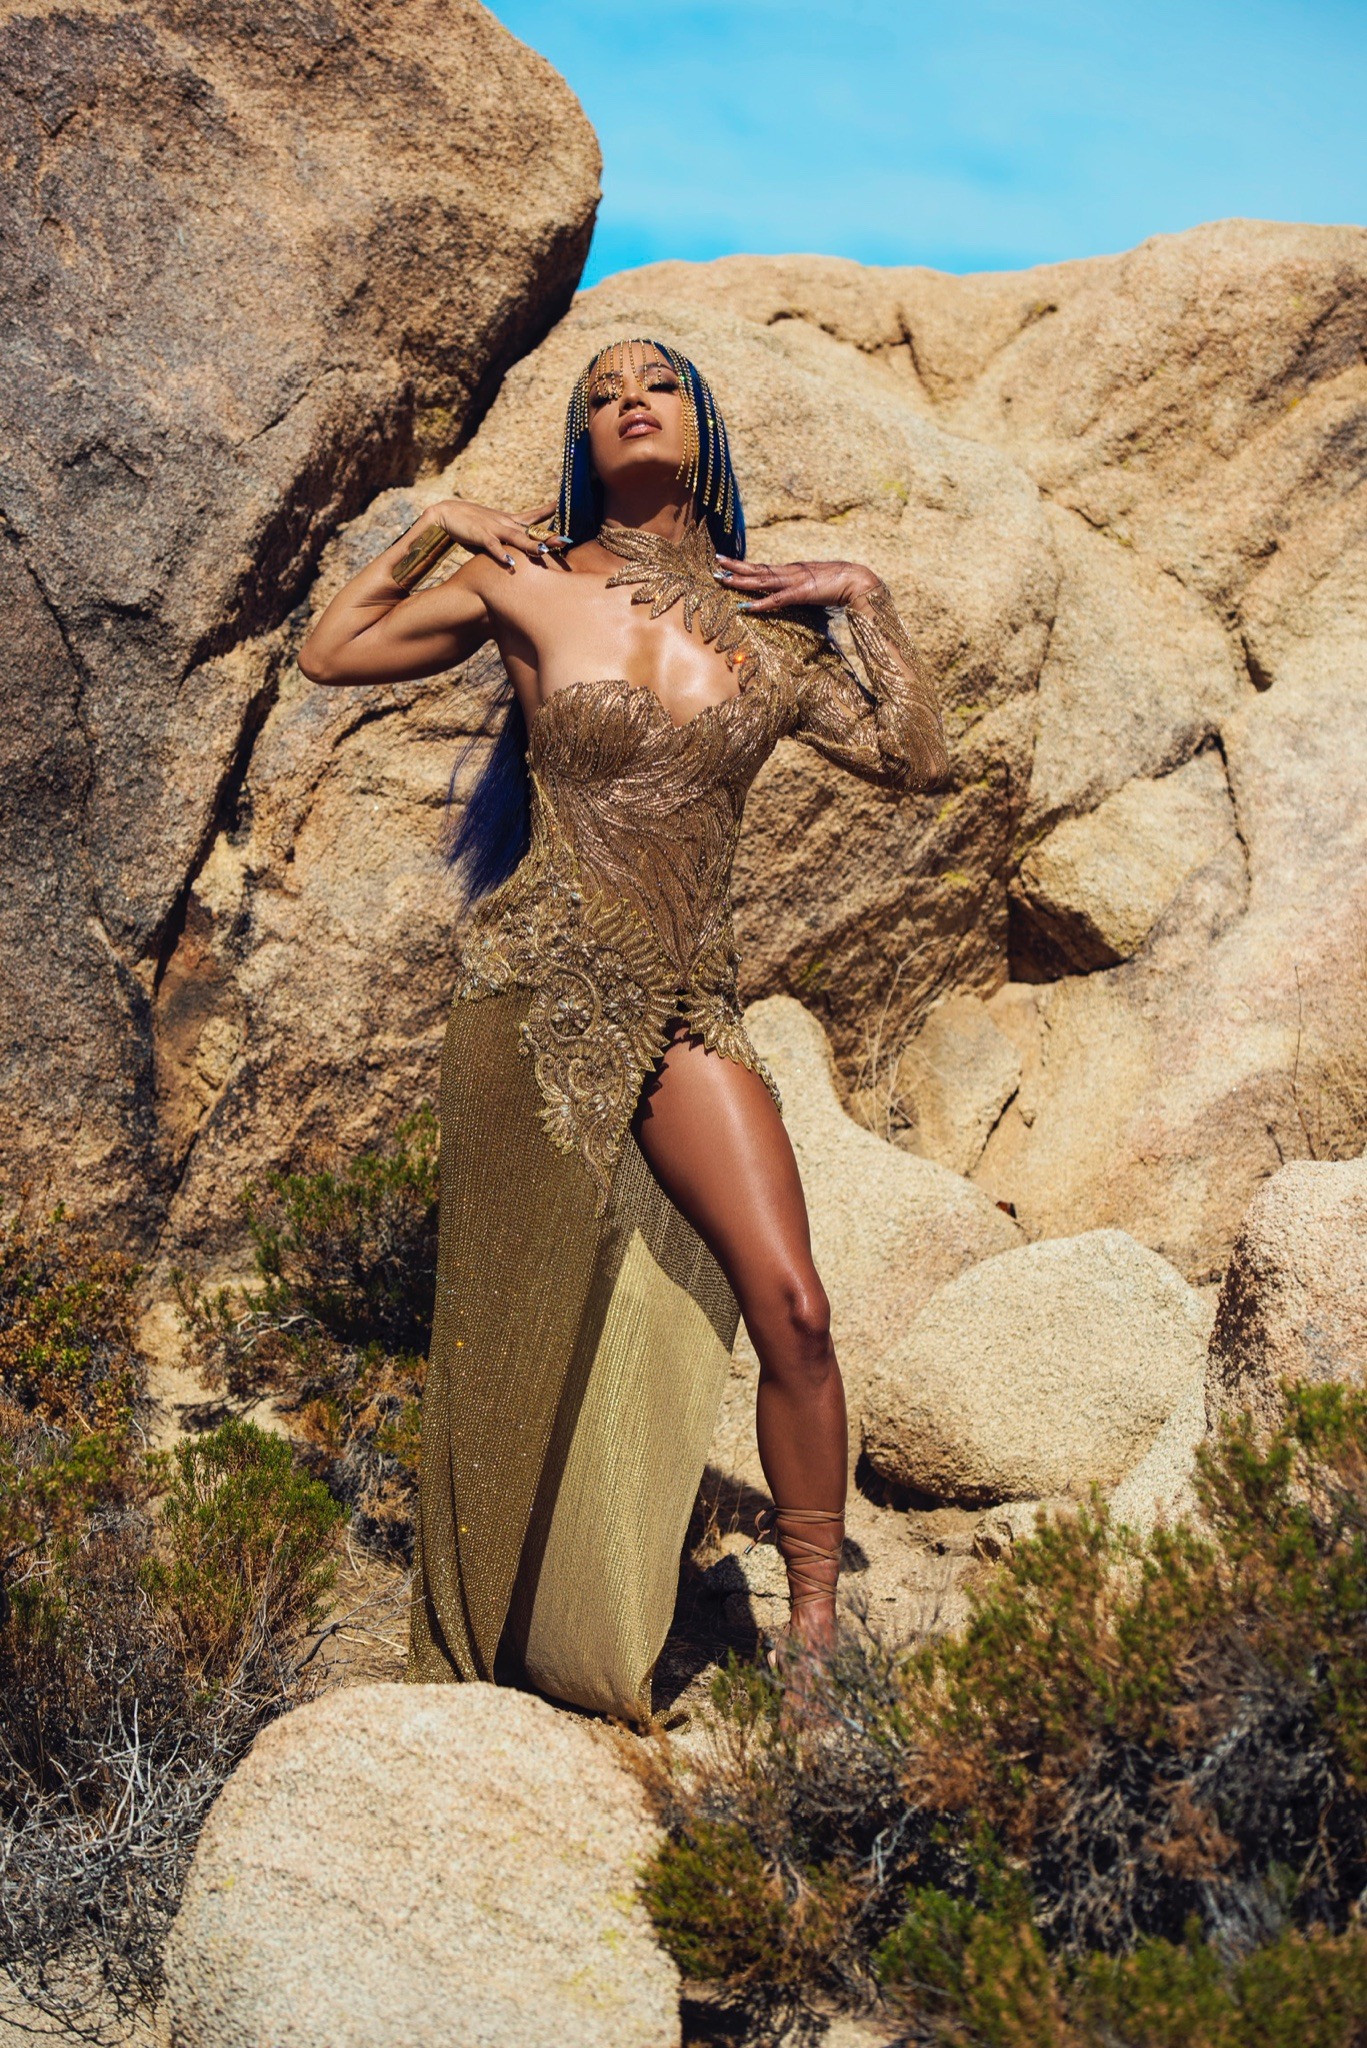 Photos: WWE Star Sasha Banks Presents Herself As An Archangel In Golden Attire 81